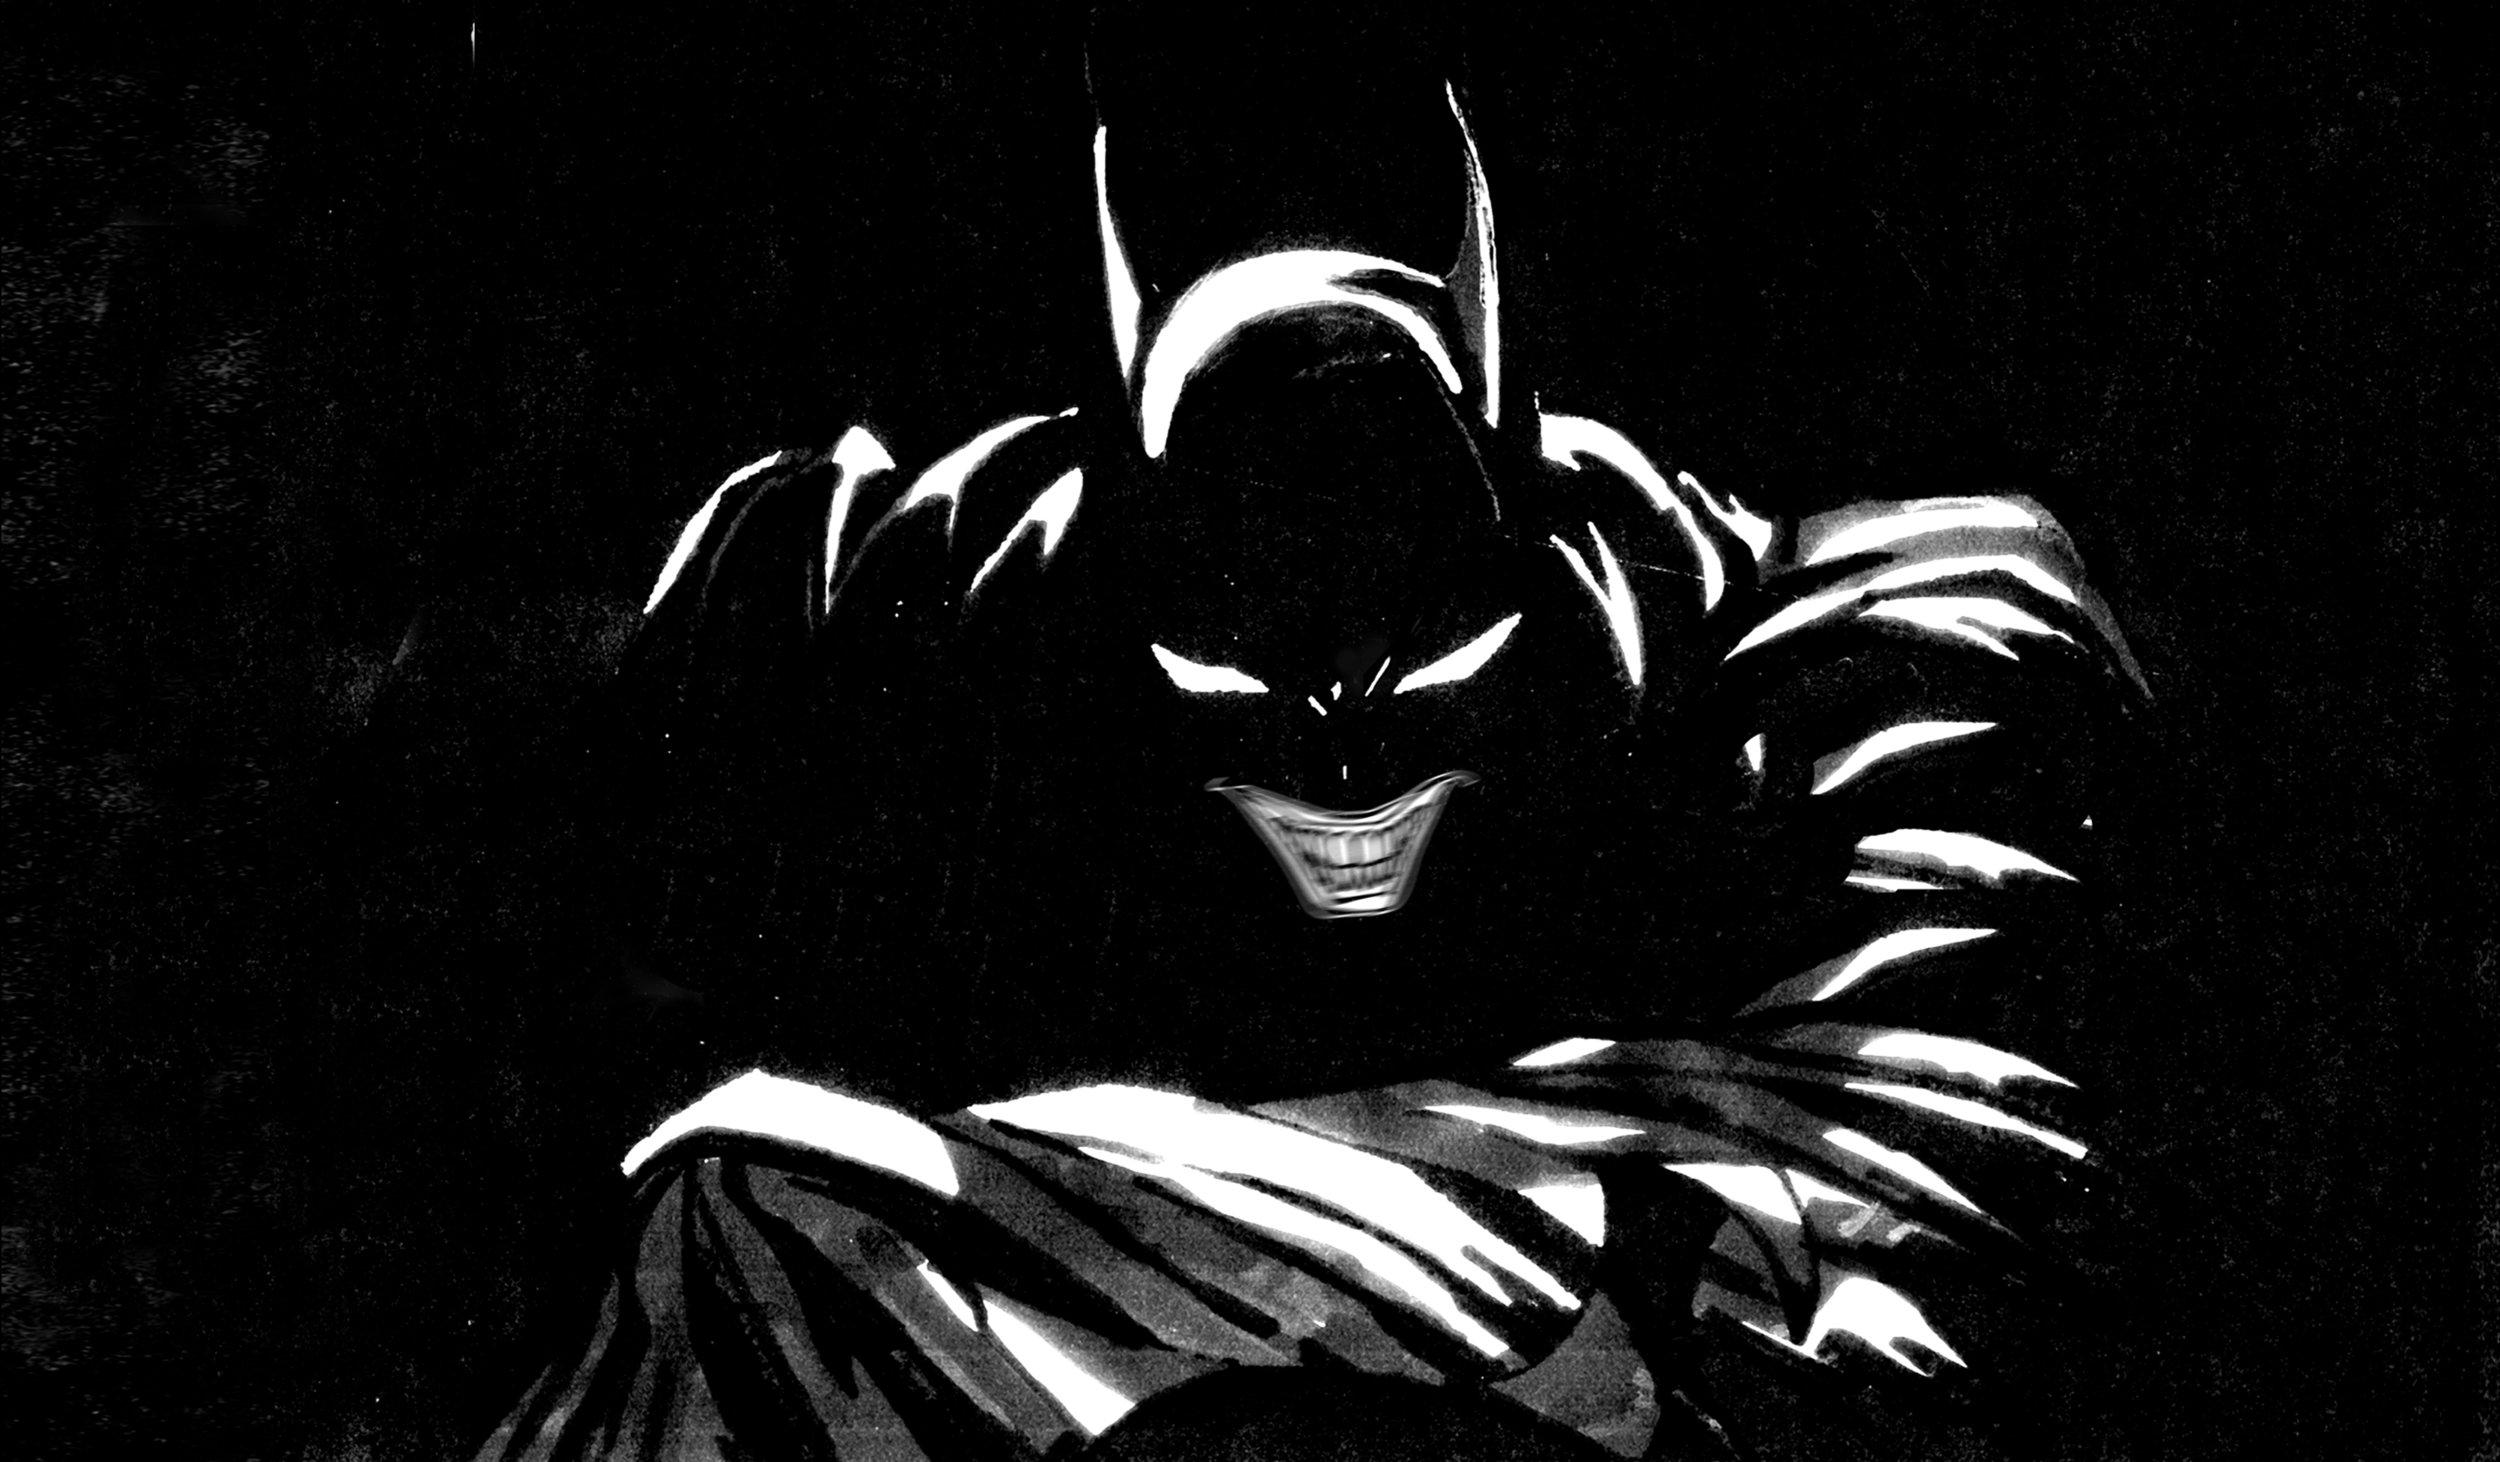 Don't forget the Joker 1 , 2006  (detail). Photo: Studio Adrian Tranquilli